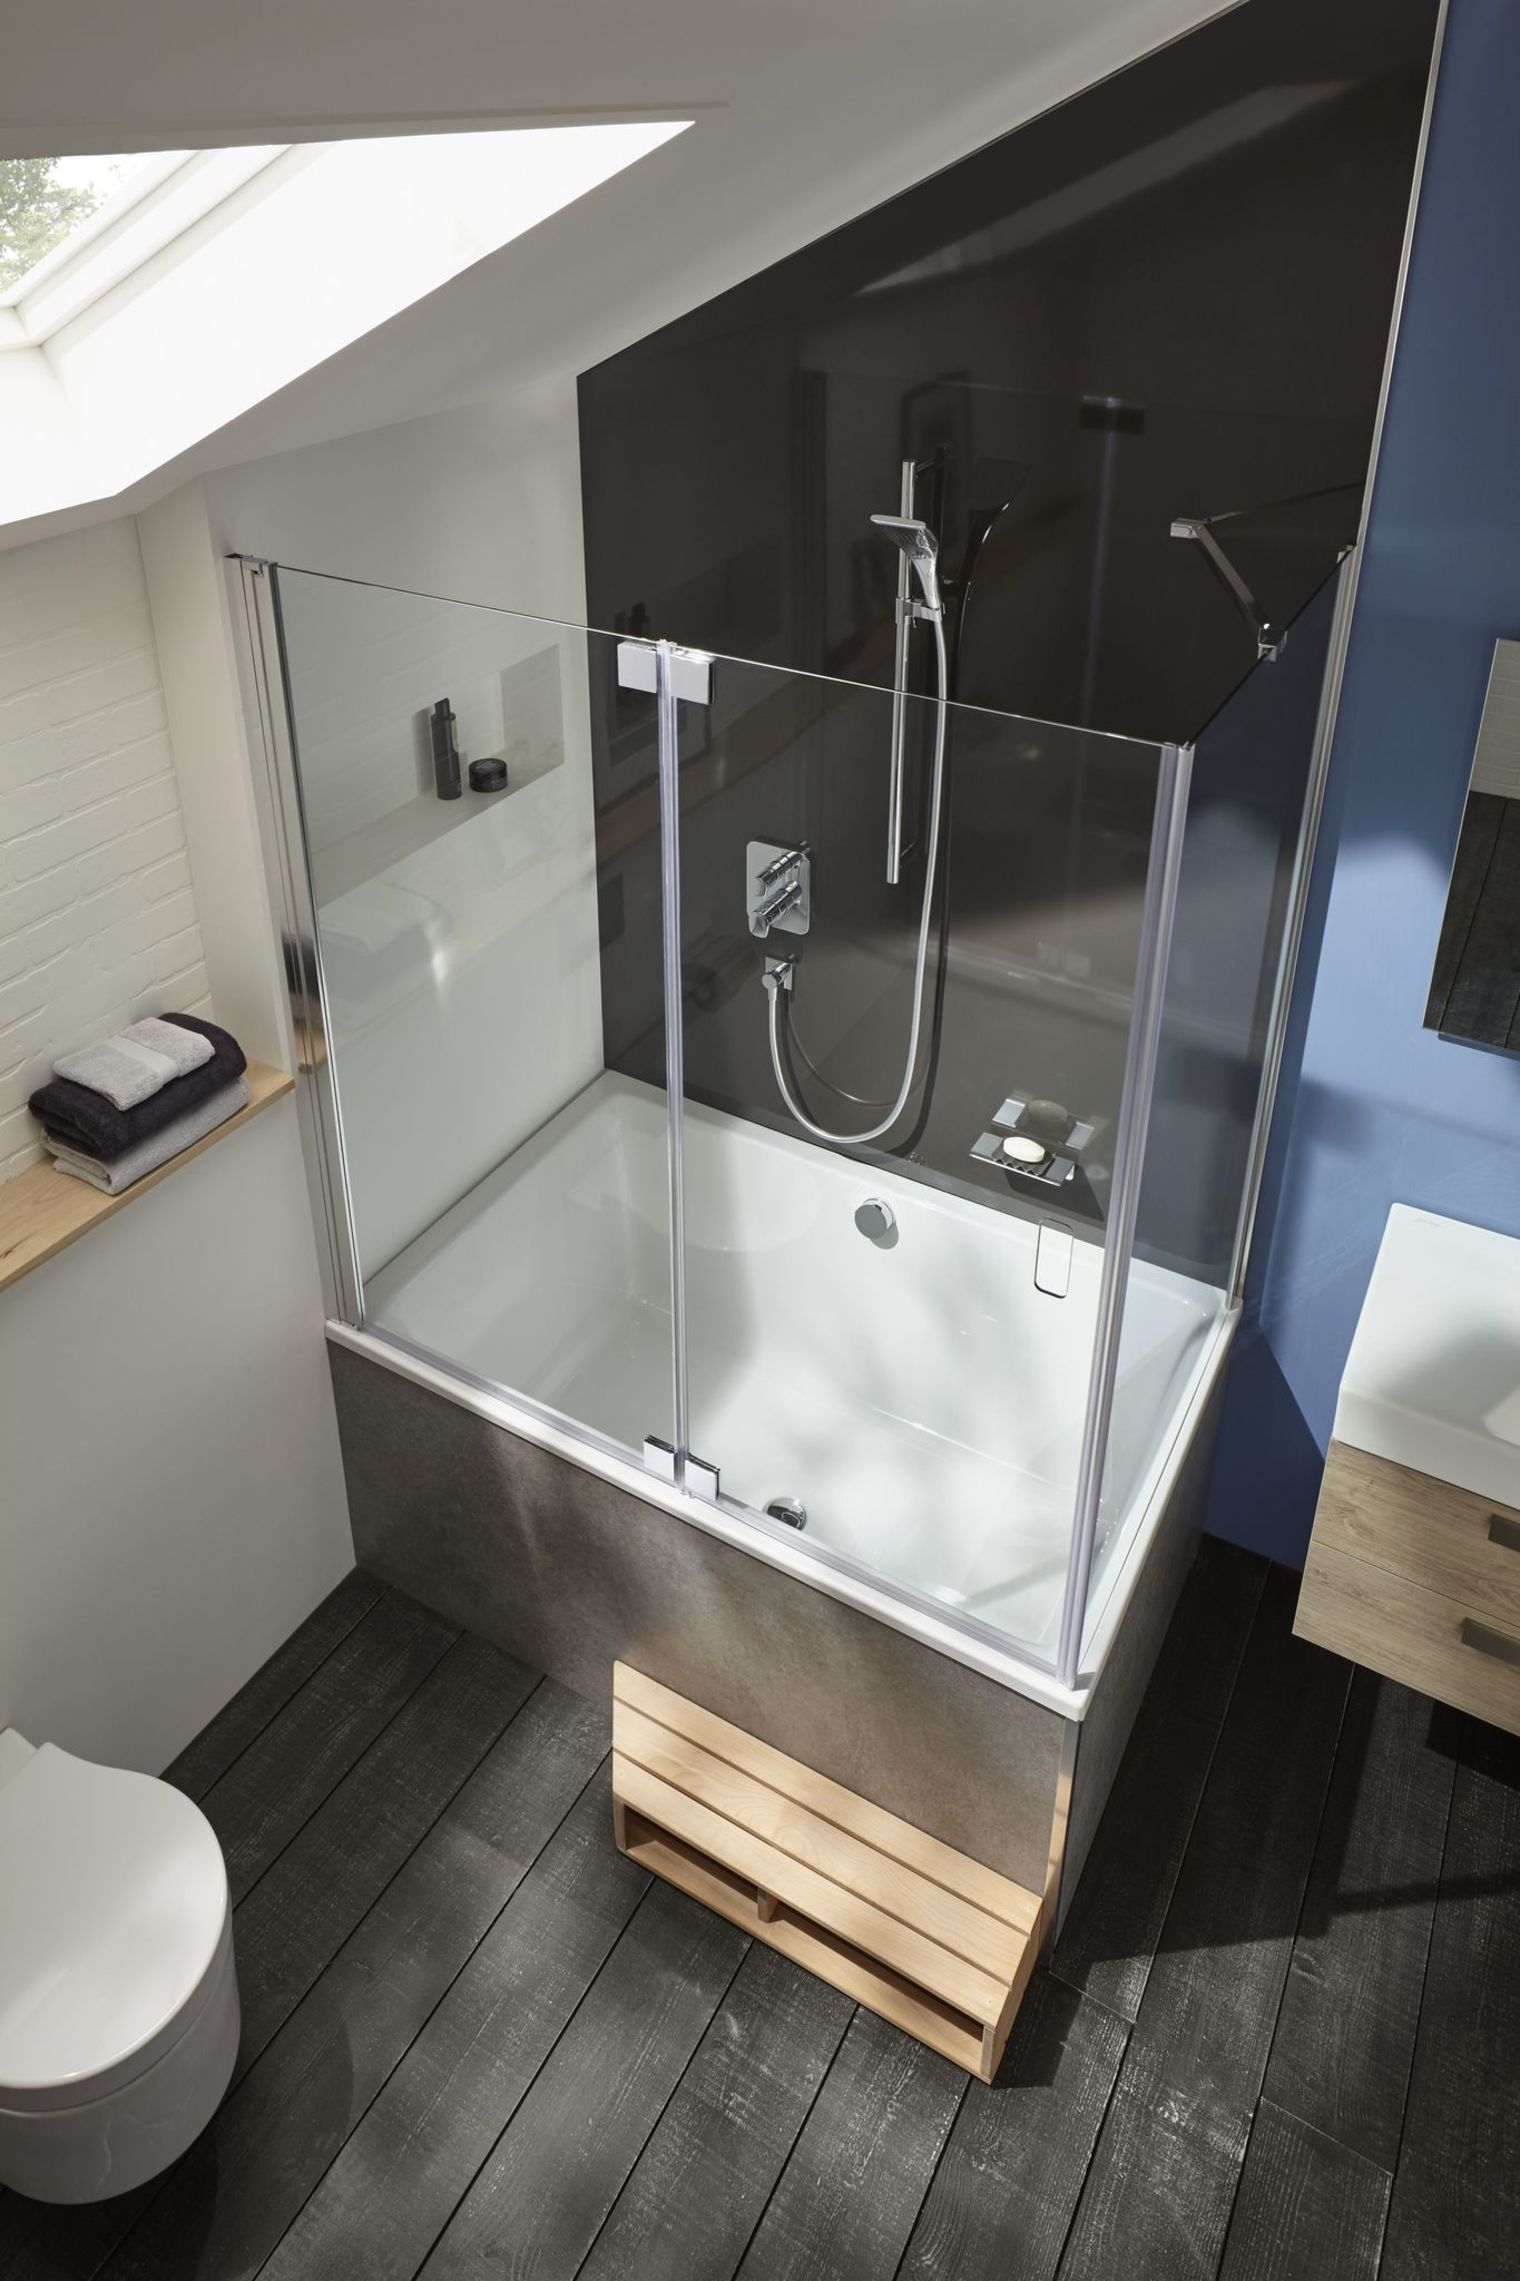 Design A Small Bathroom 12 Thoughtful Solutions Amenager Petite Salle De Bain Petite Salle De Bain Salle De Bain Baignoire Douche